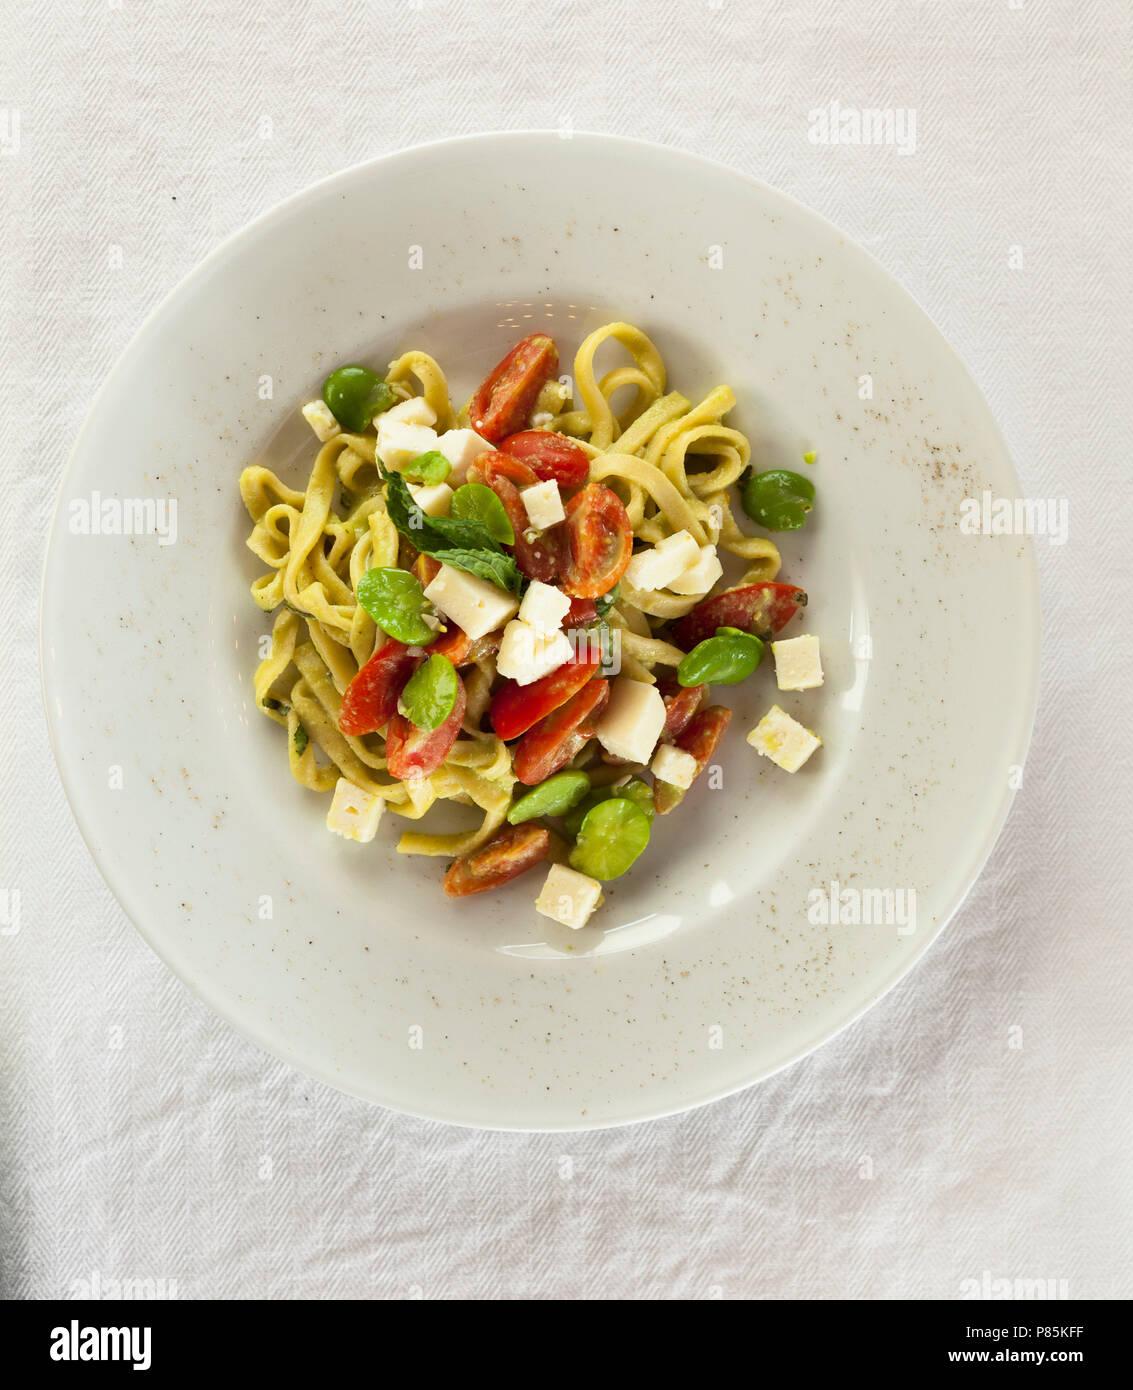 Comida italiana Imagen De Stock